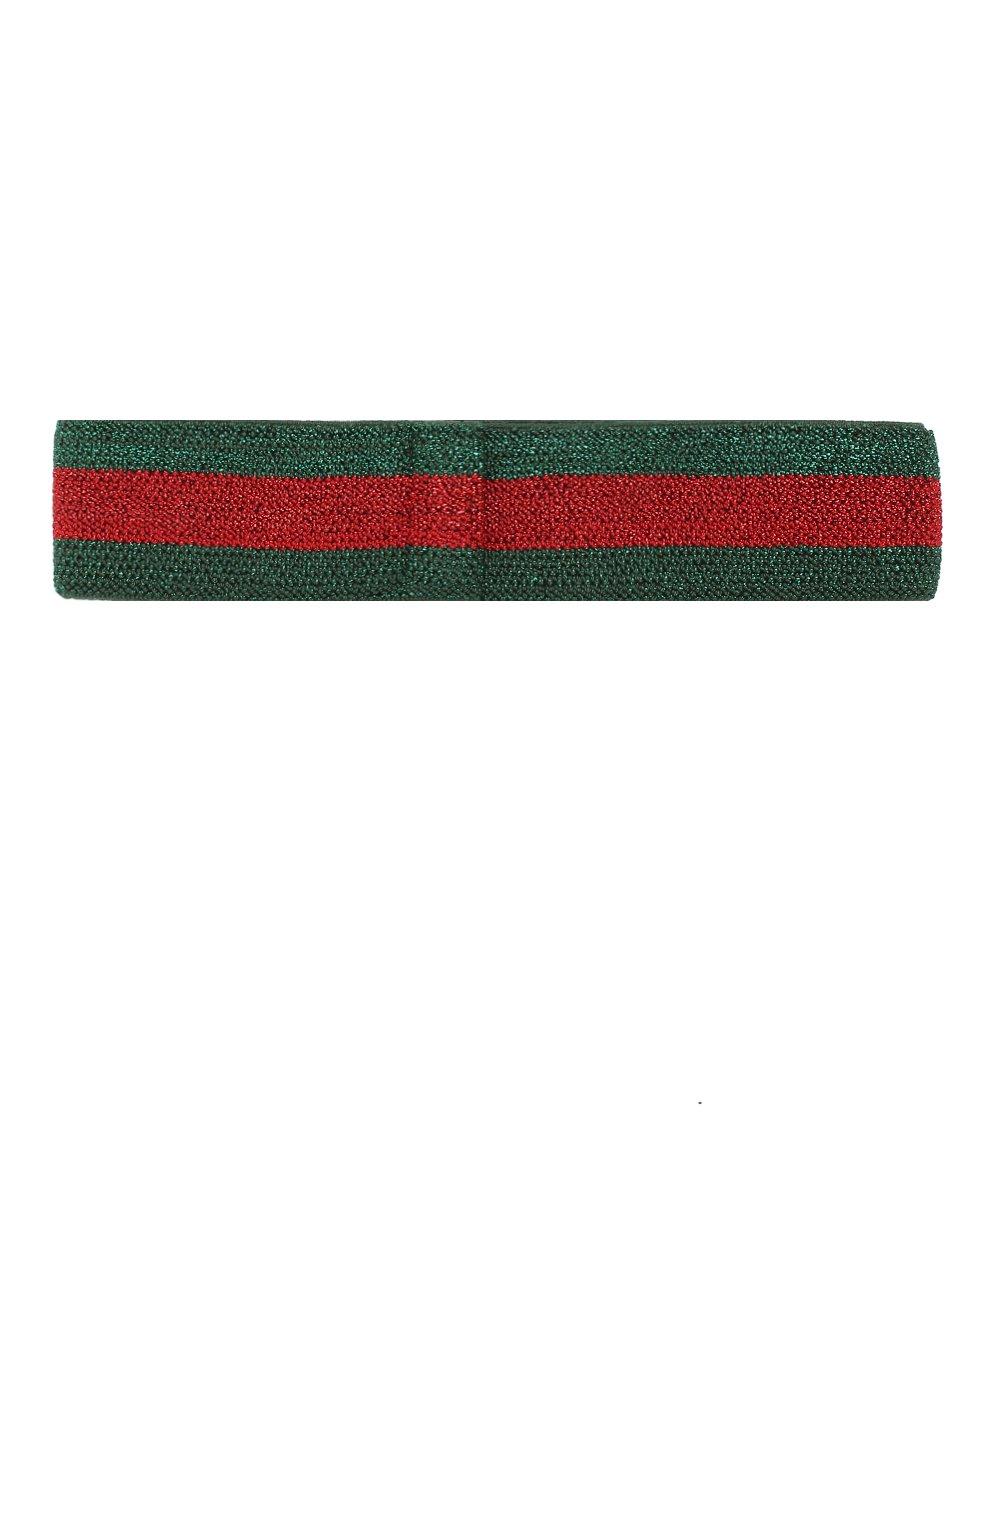 Детская повязка на голову GUCCI зеленого цвета, арт. 508438/4K087   Фото 2 (Материал: Текстиль, Вискоза; Статус проверки: Проверено, Проверена категория)